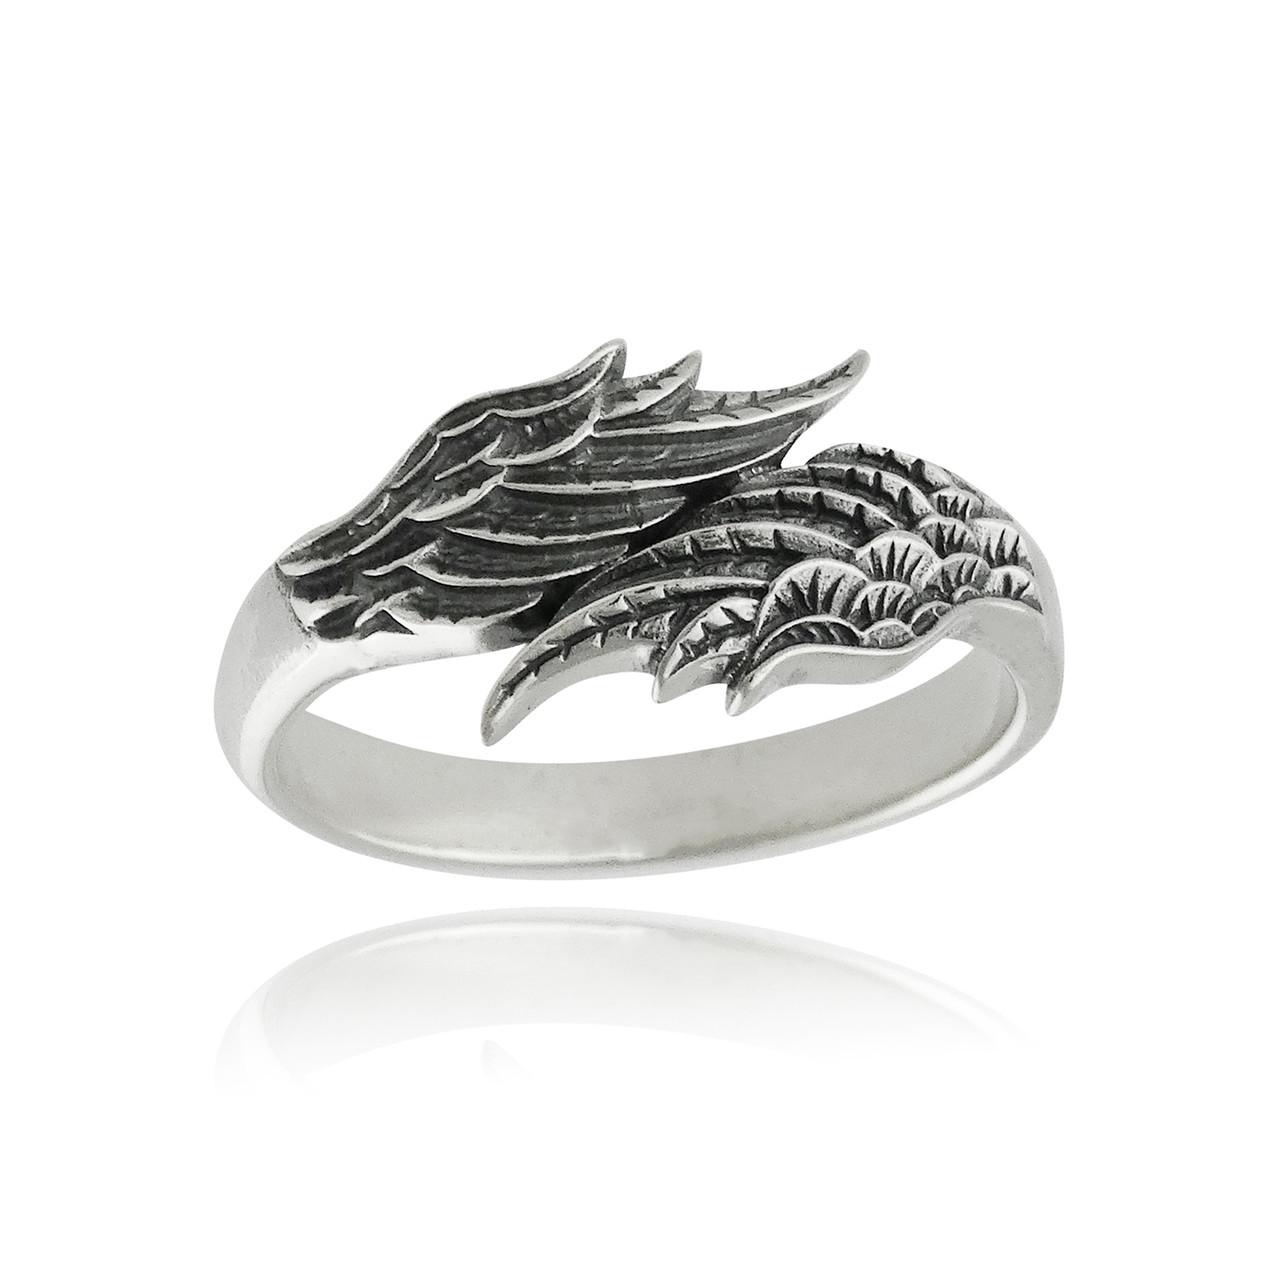 Angel Wings Ring Sterling Silver Fashionjunkie4life